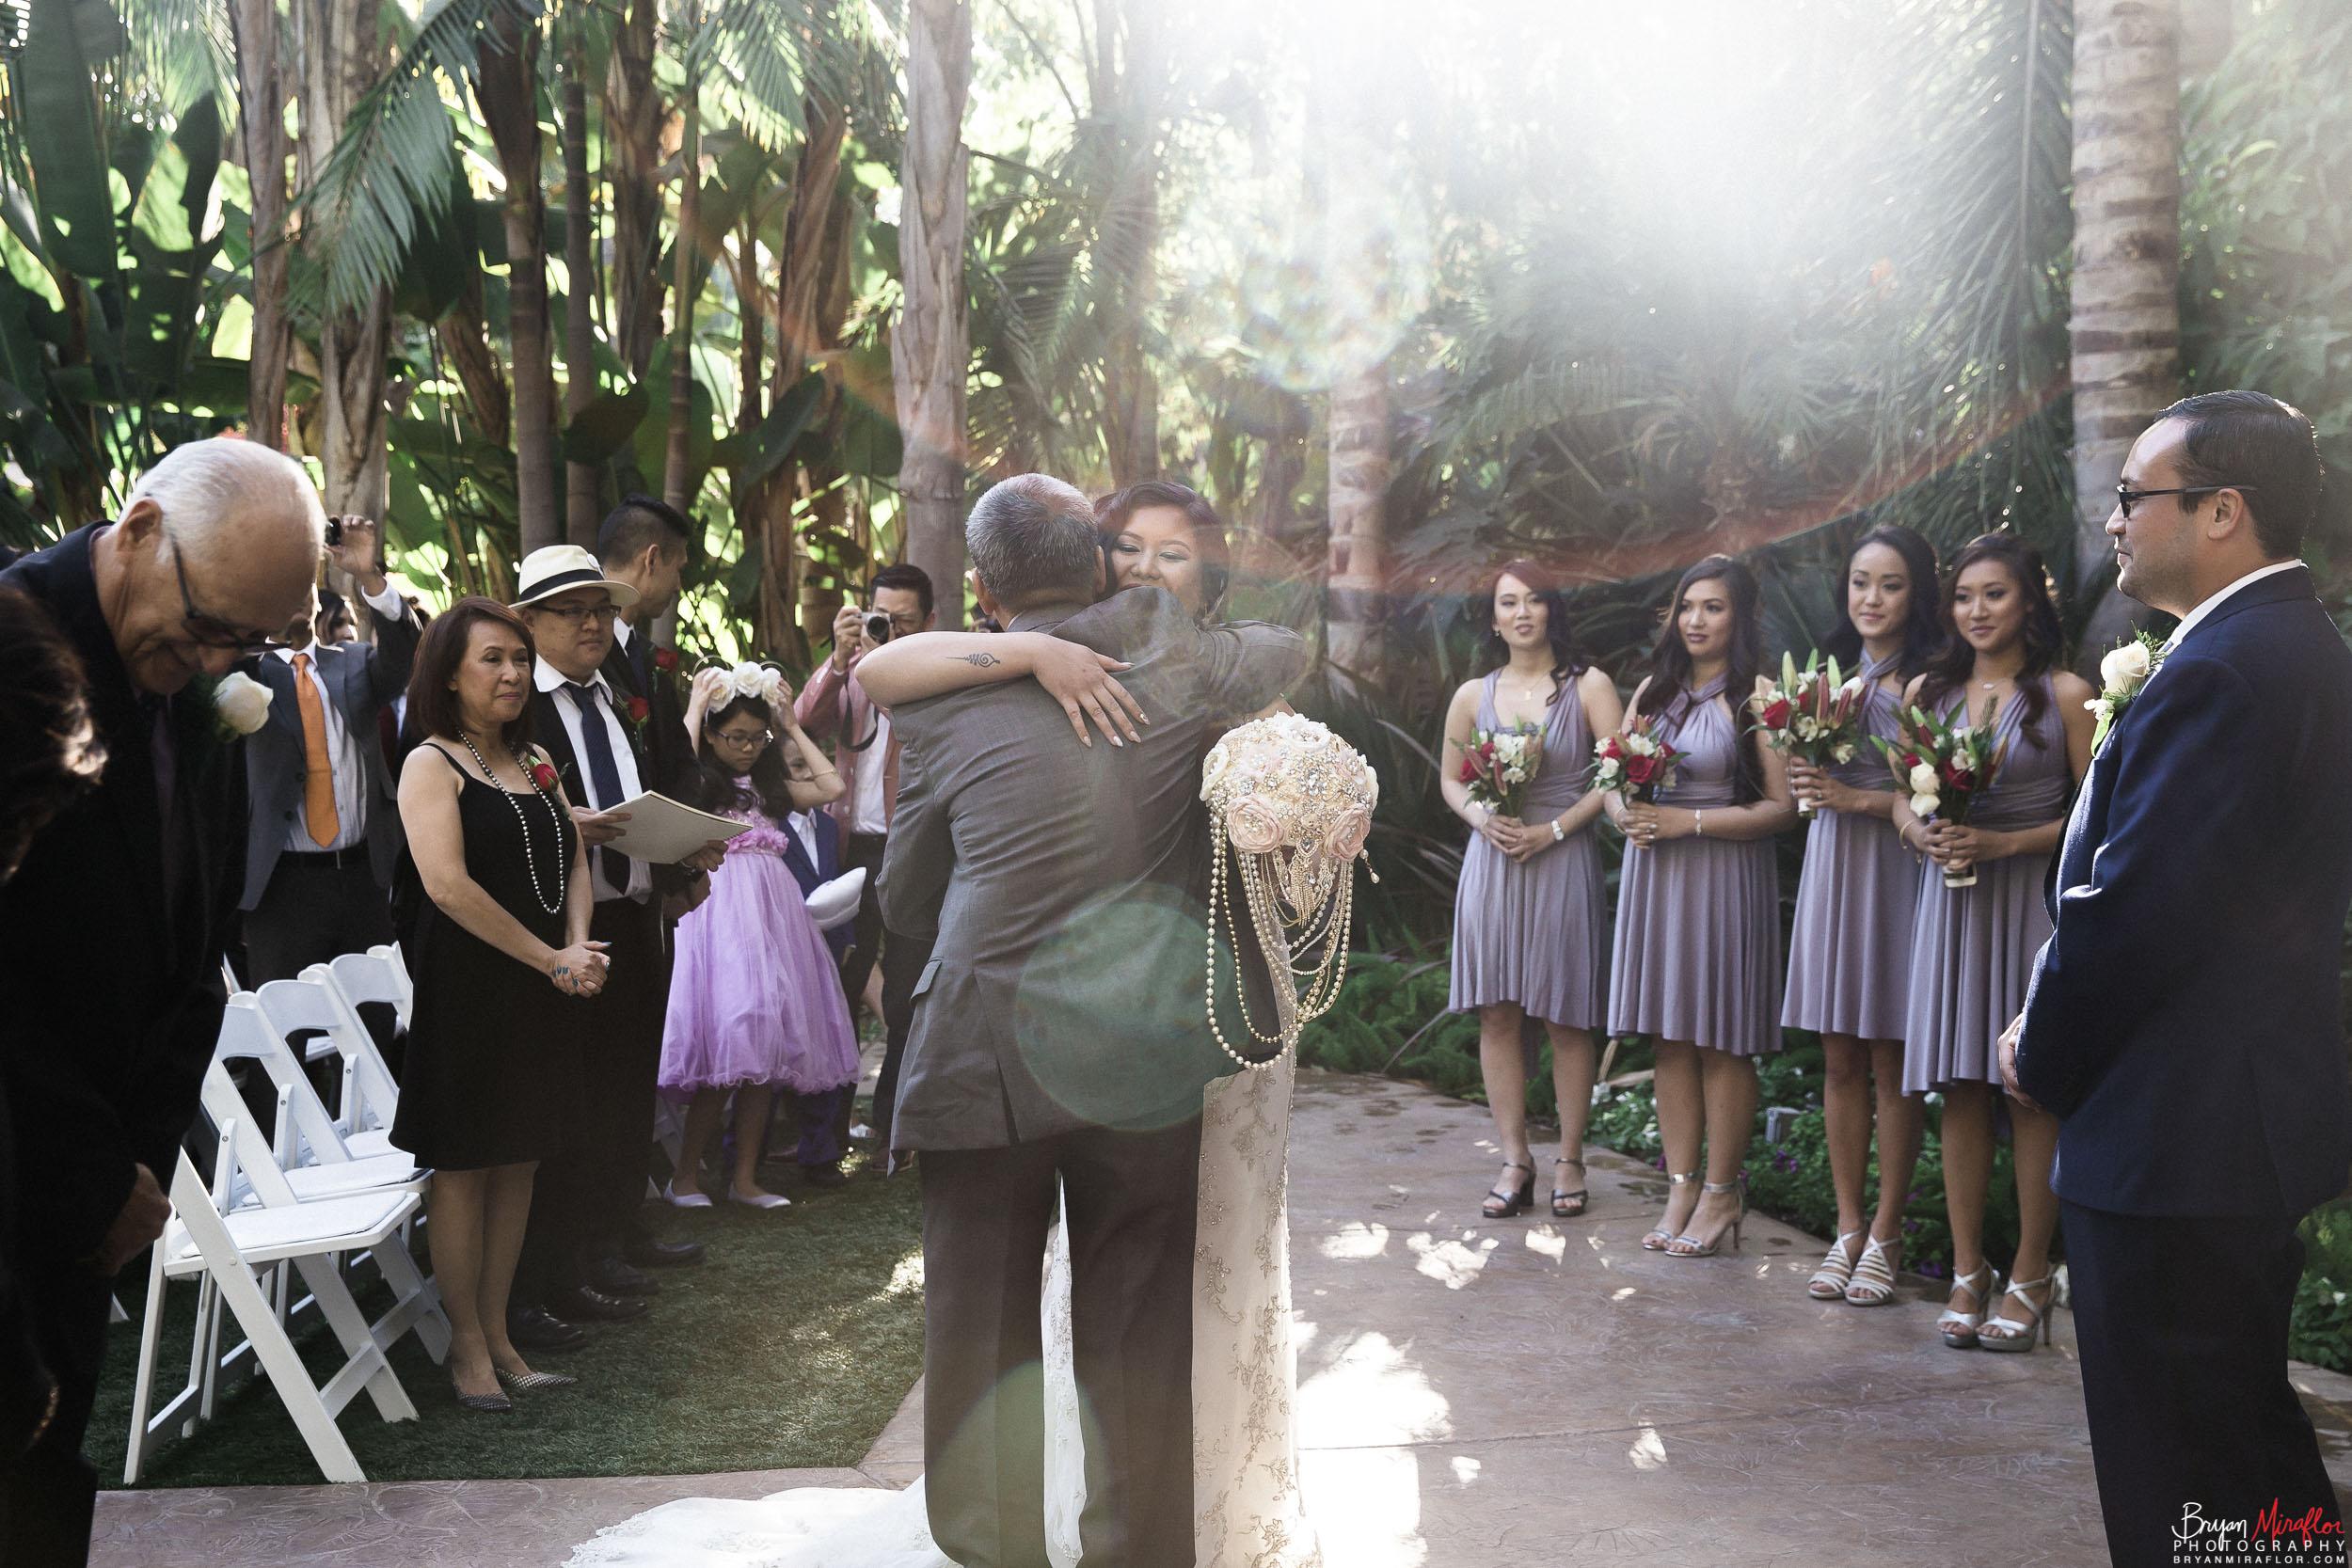 Bryan-Miraflor-Photography-Hannah-Jonathan-Married-Grand-Traditions-Estate-Gardens-Fallbrook-20171222-095.jpg